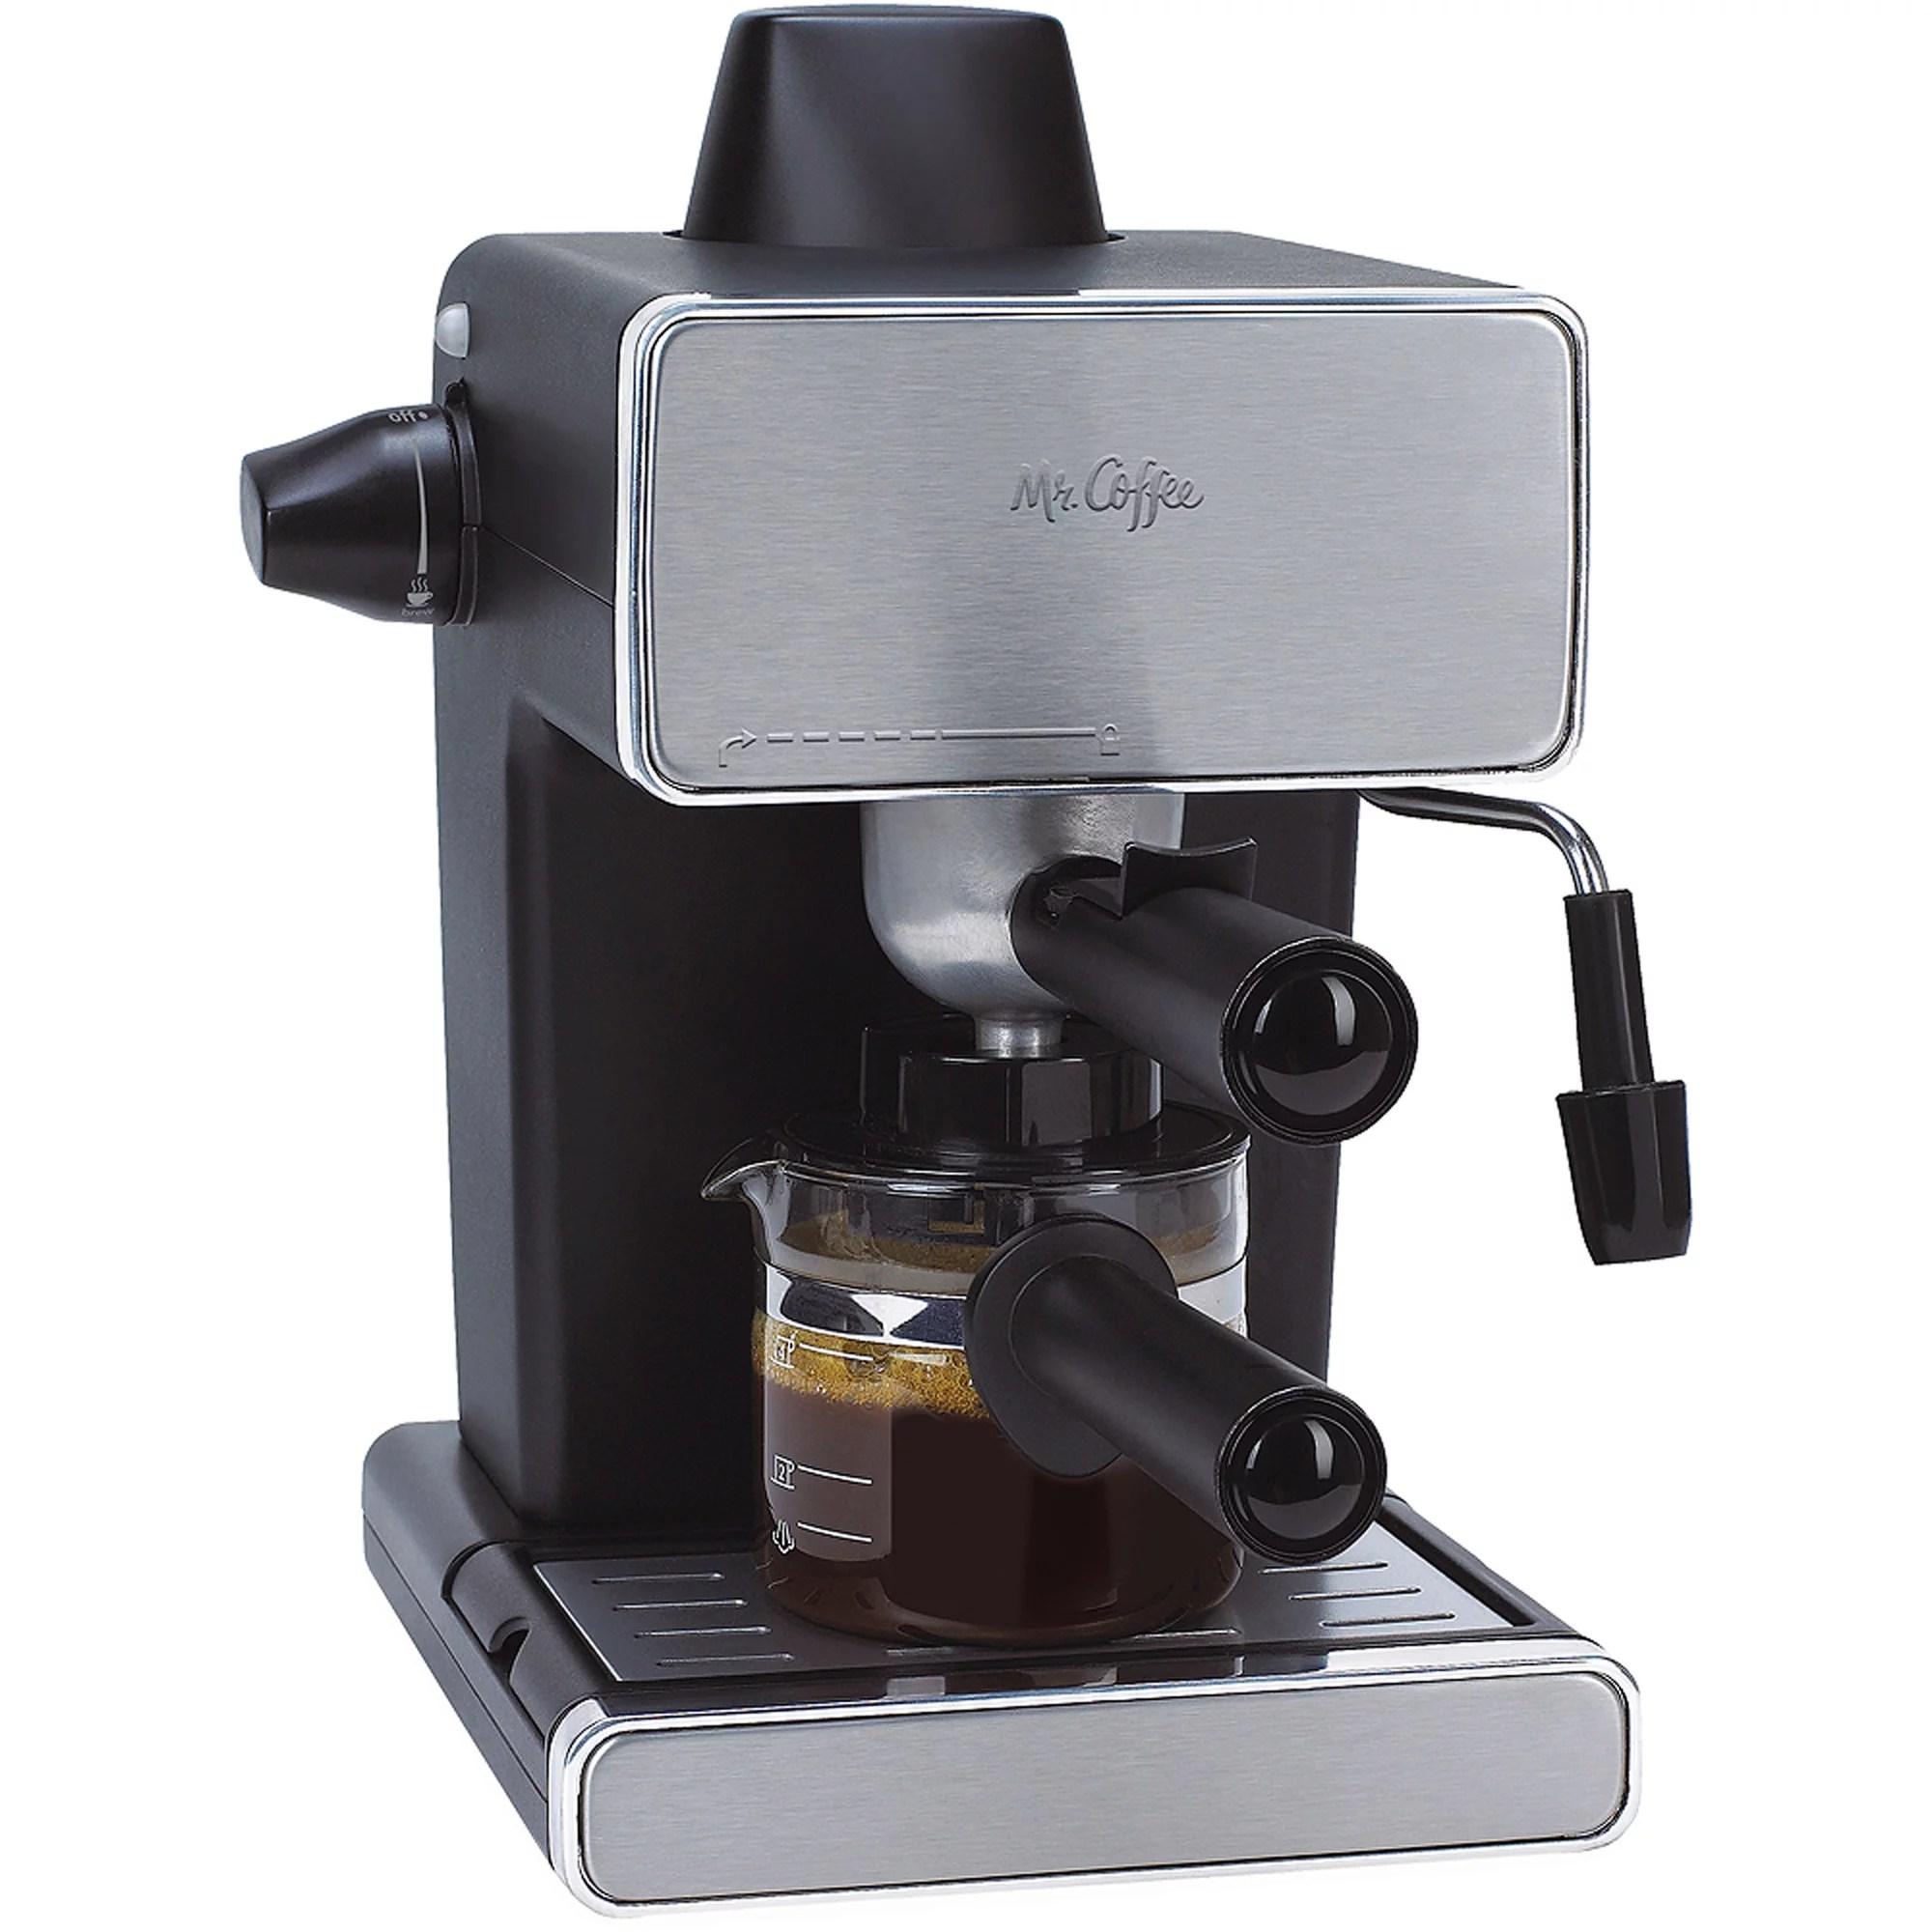 Coffee 1 2 Programmable Maker Cup Walmart Mr Coffee